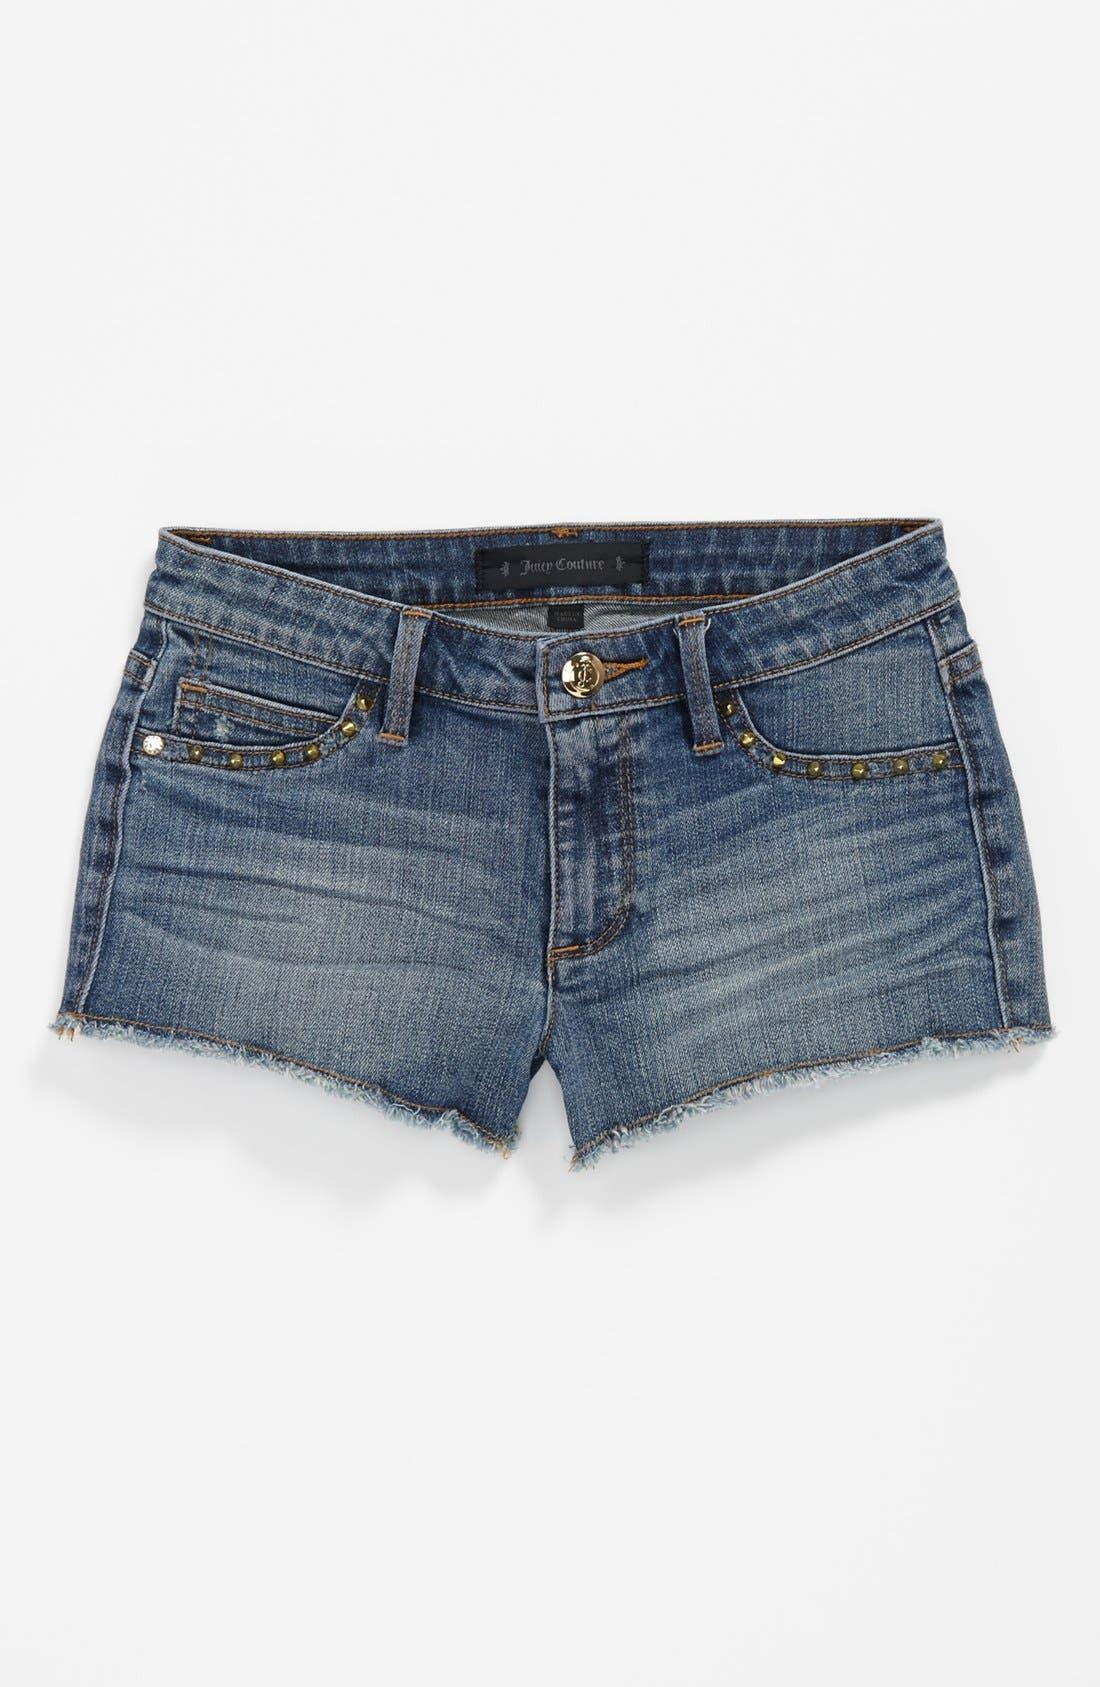 Alternate Image 2  - Juicy Couture 'Core' Denim Cutoff Shorts (Big Girls)